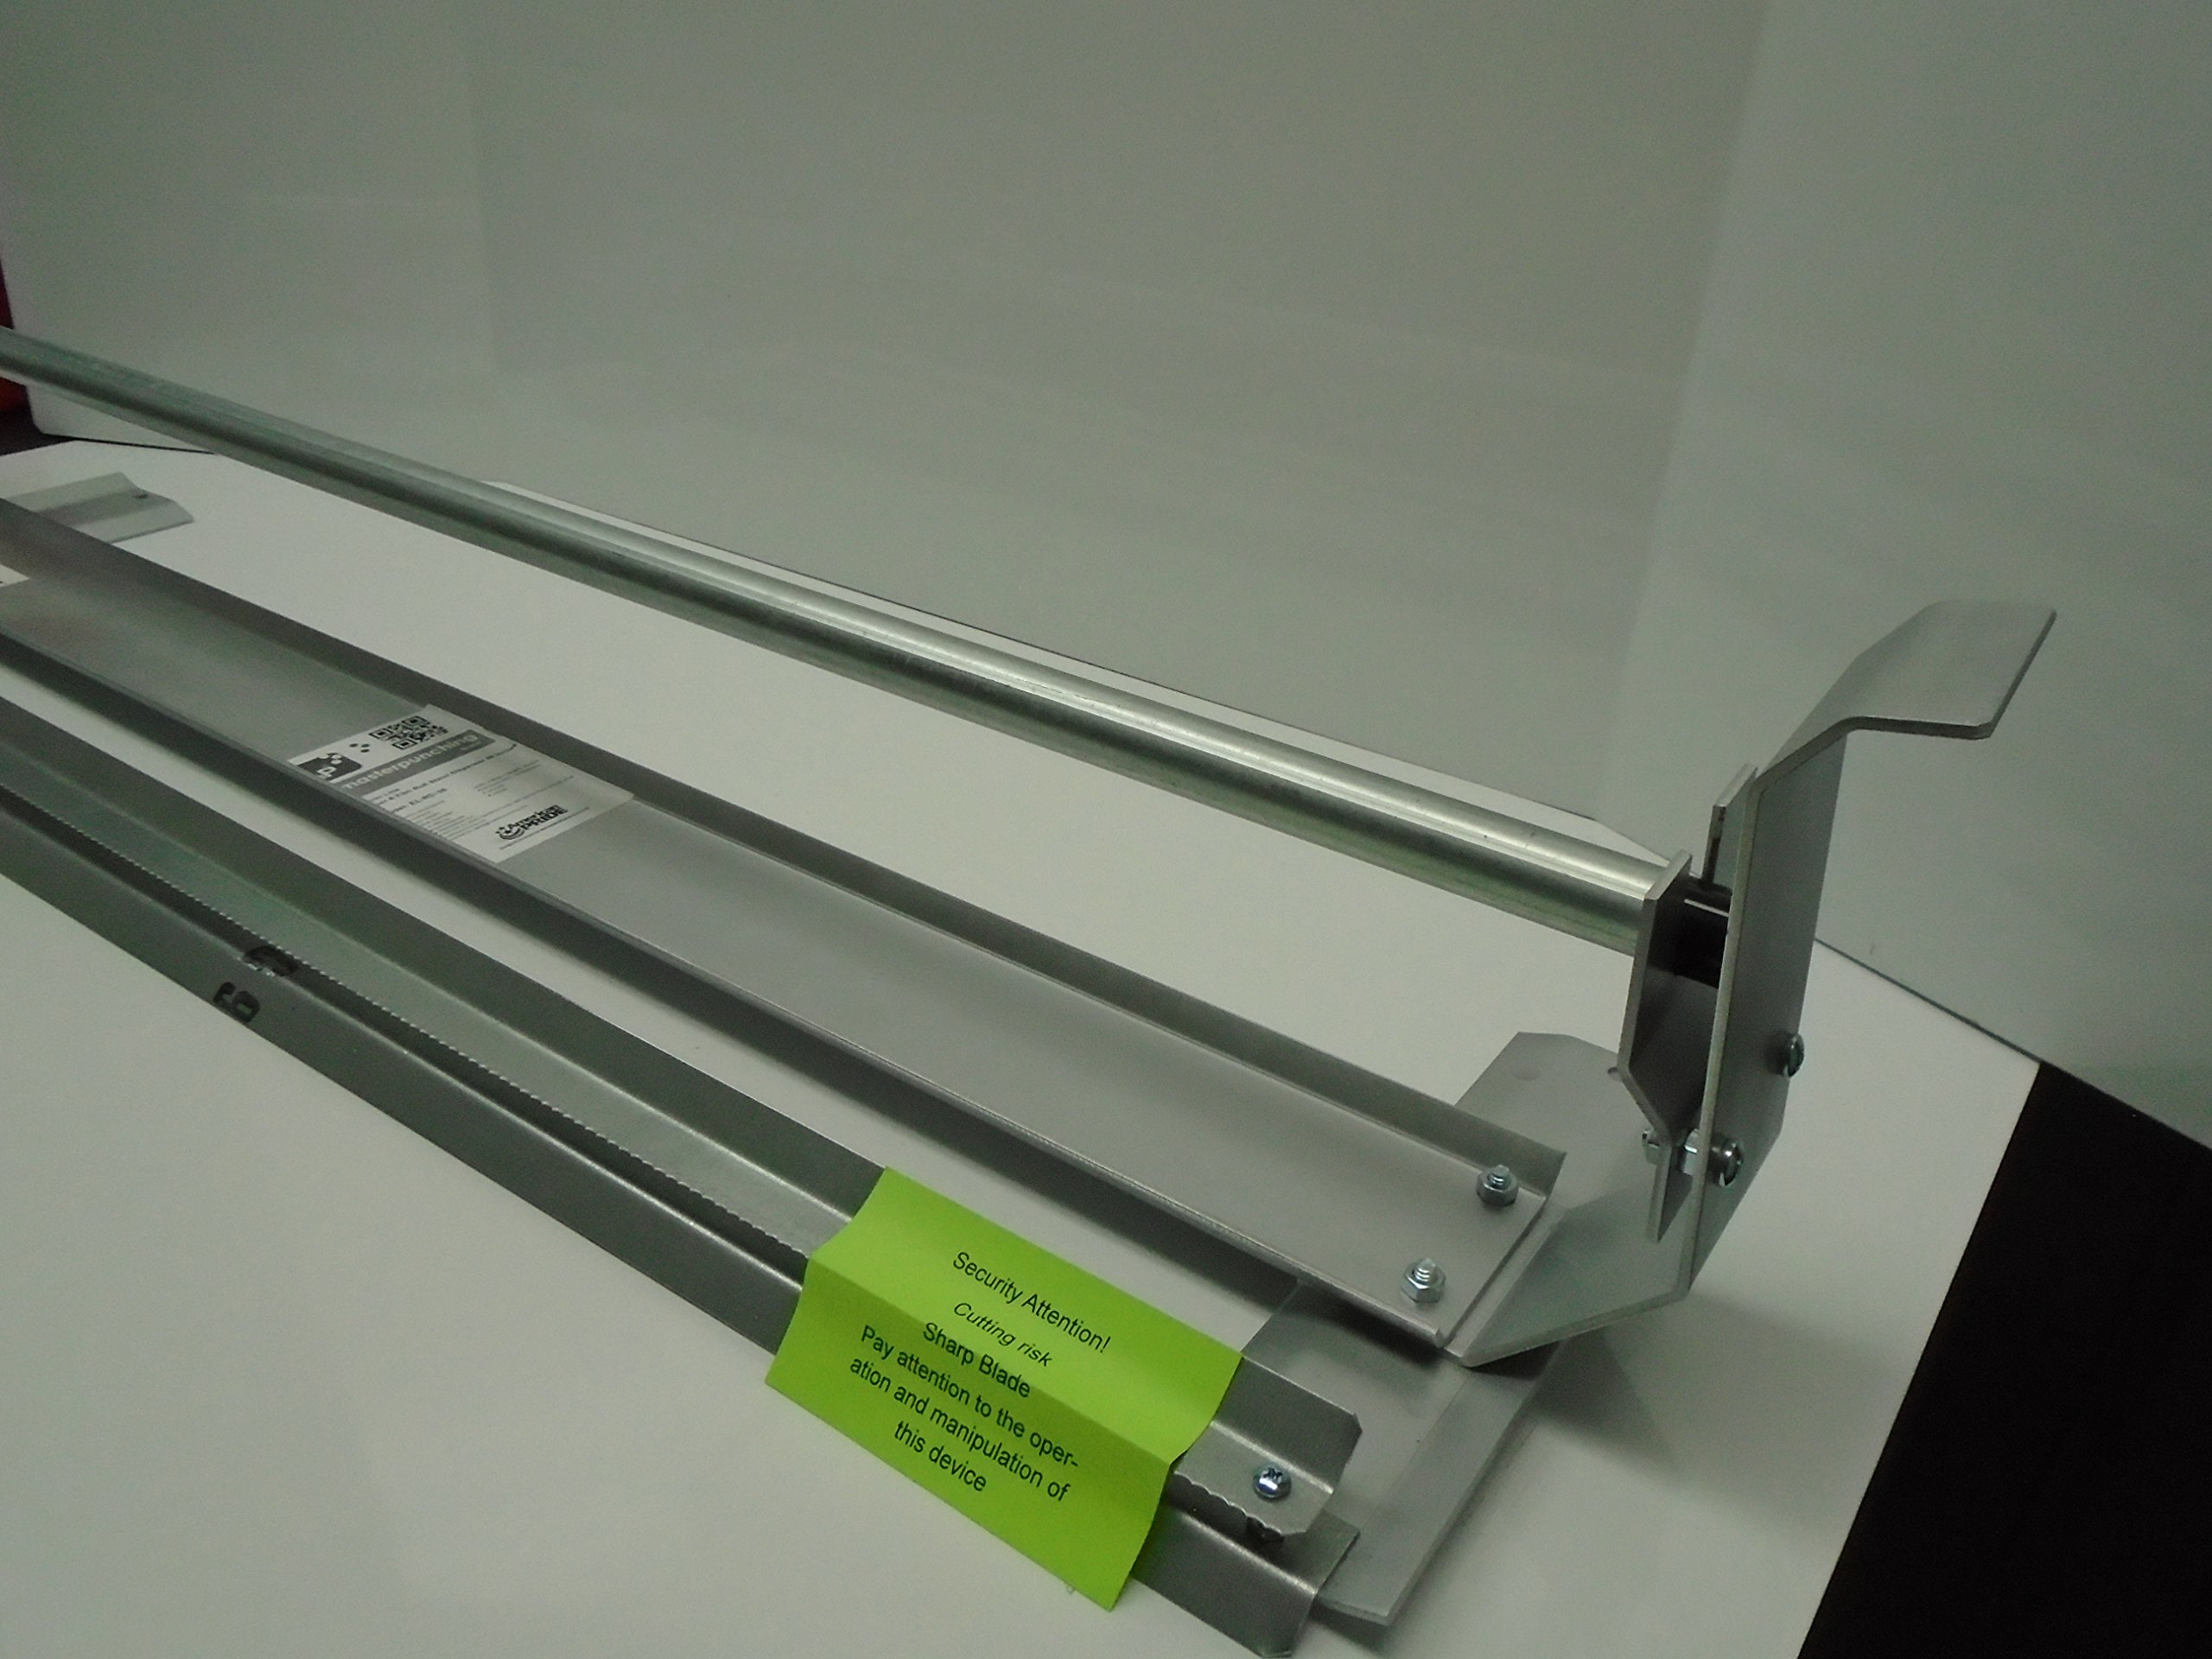 Paper Cutter Roll Dispenser Econoline 60 inches table mount Kraft paper Duralov by Duralov (Image #5)